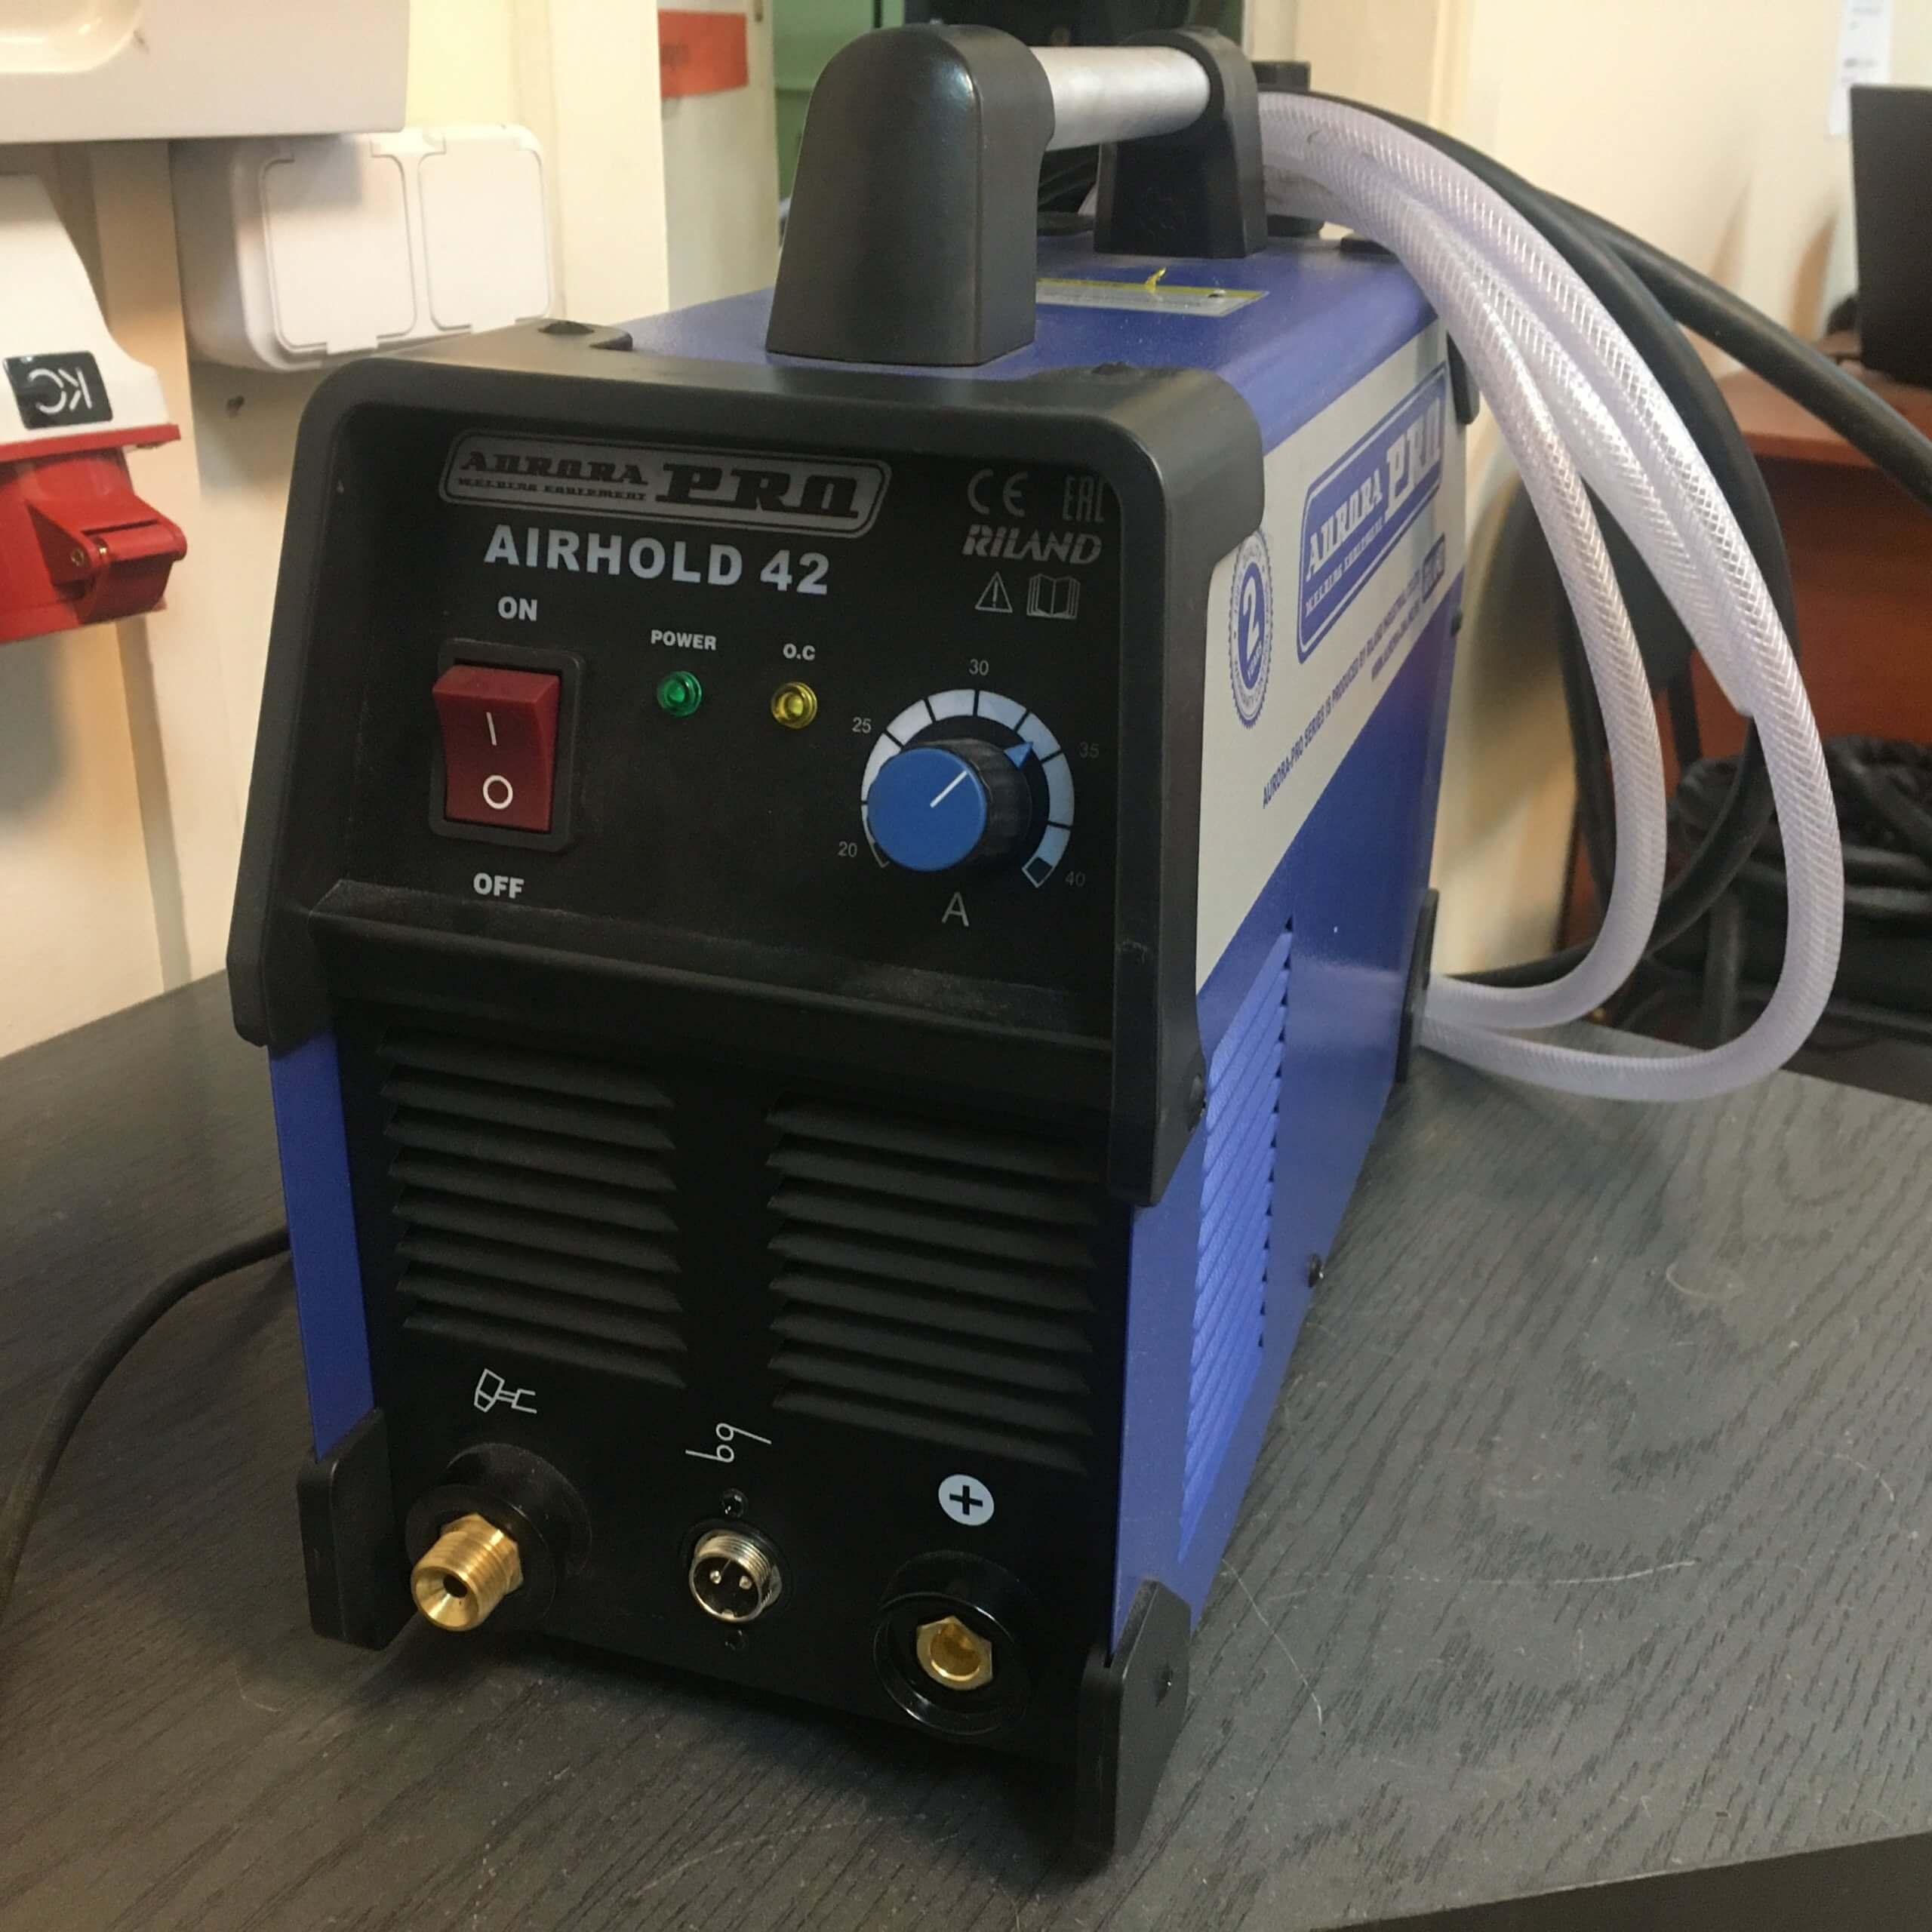 Аппарат плазменной резки Aurora PRO AIRHOLD 42 (б/у)